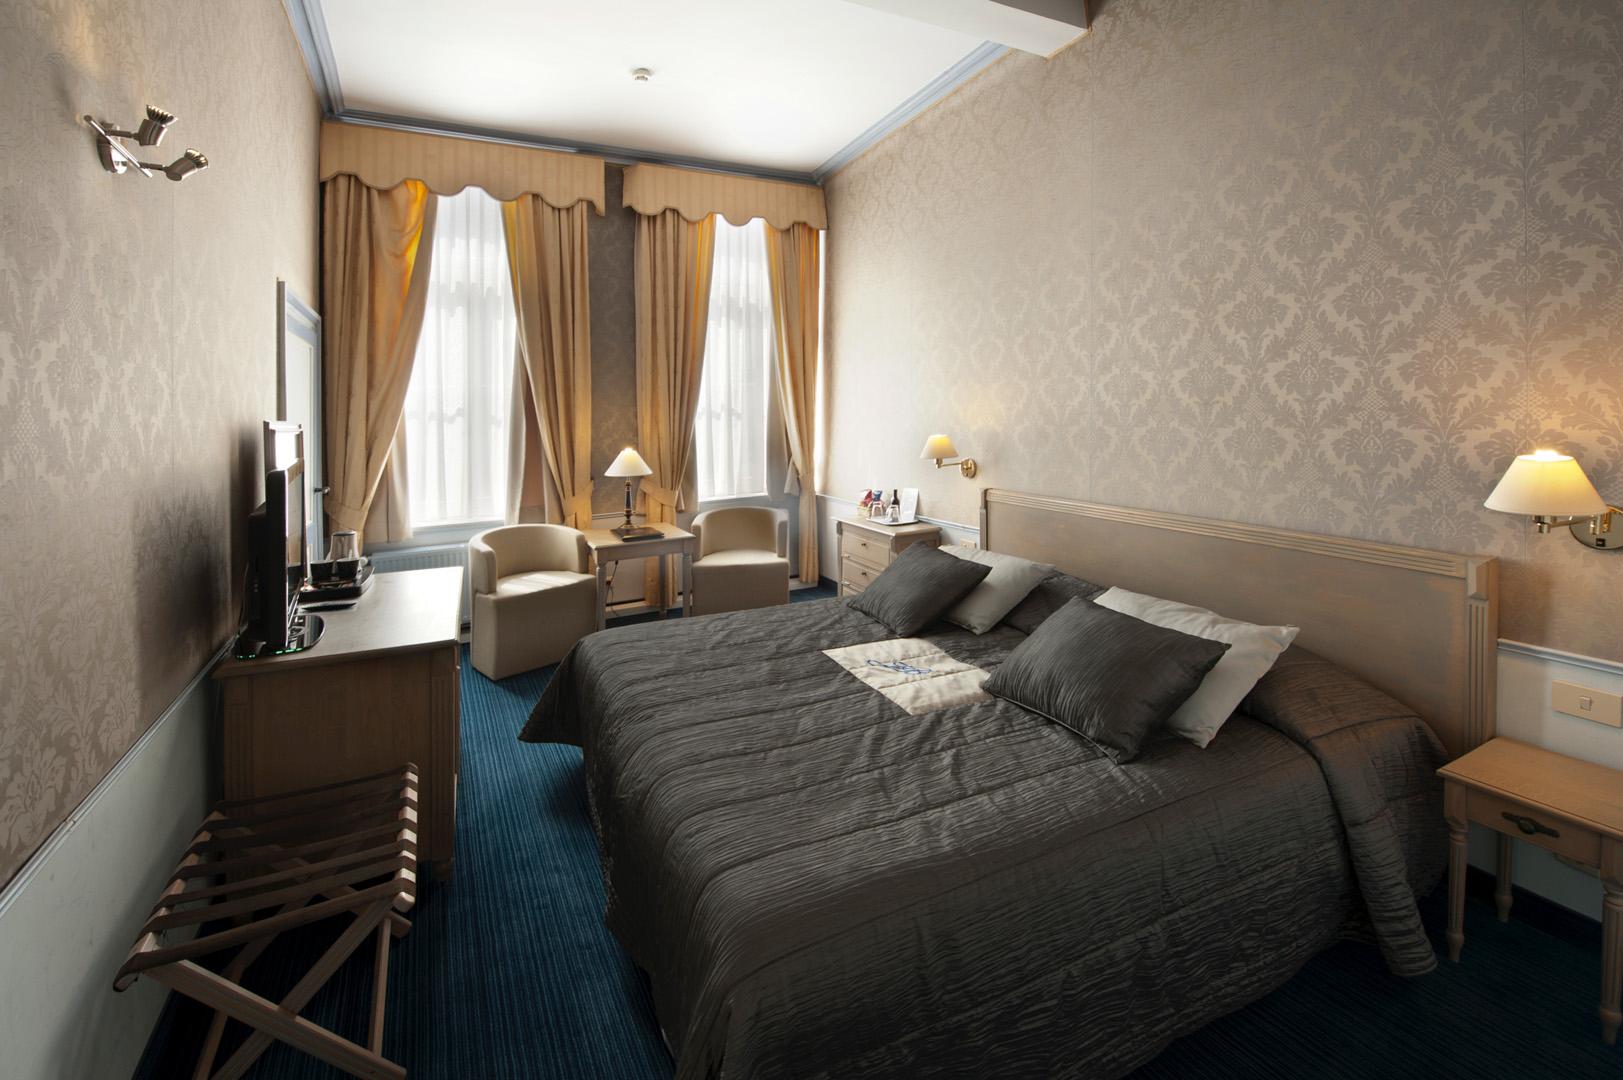 Standaard kamer hotel jan brito brugge belgium - Deco kamer onder dekking ...